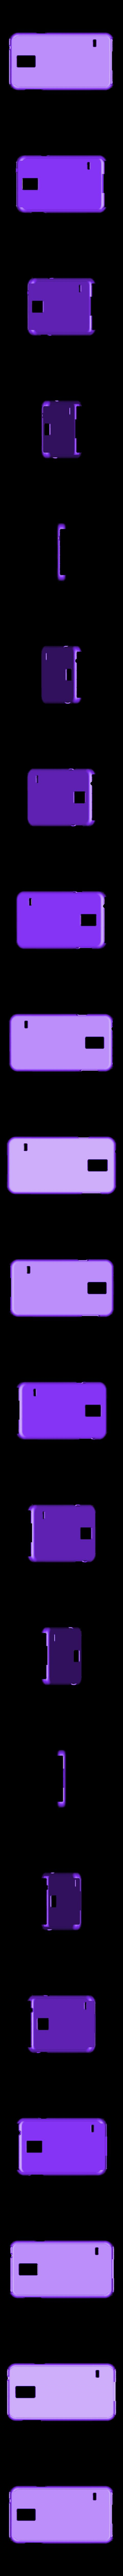 S5_rev4-3.stl Download free STL file Galaxy S5 Hard Case • Design to 3D print, Umqais